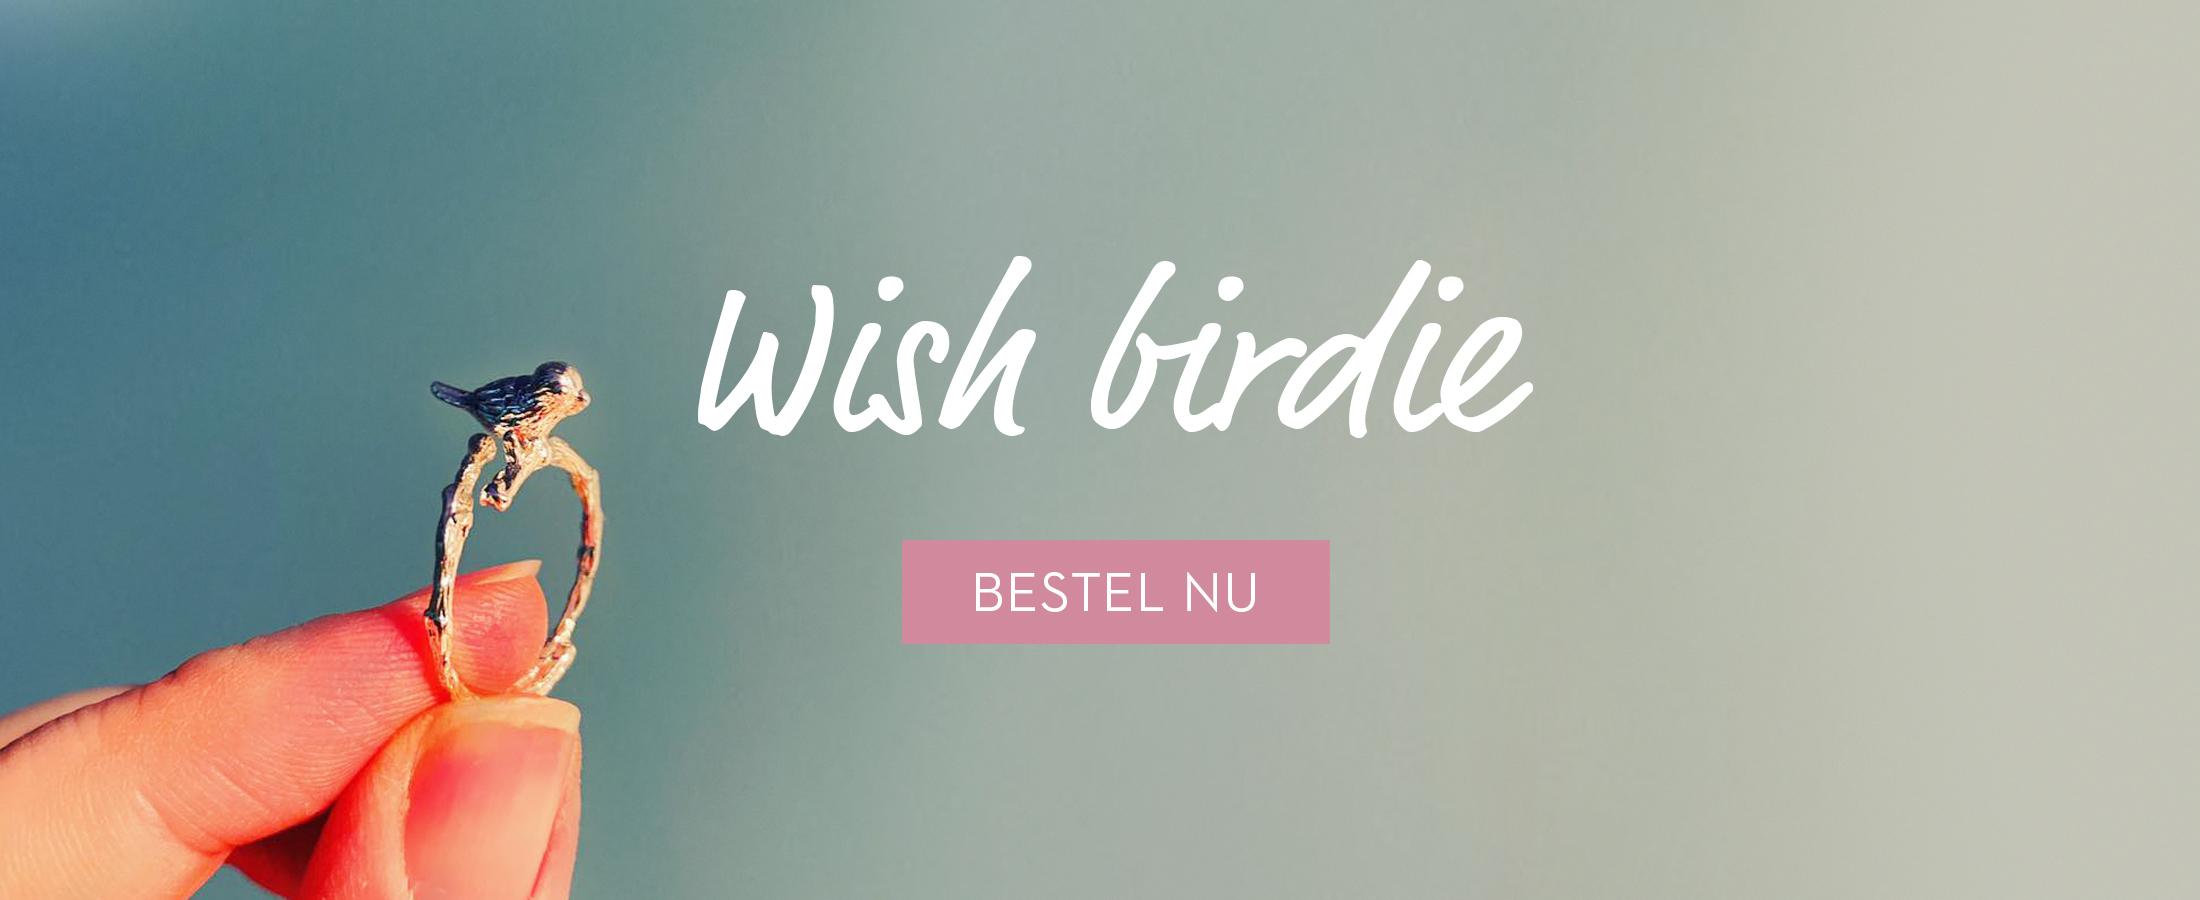 Wish birdie ring